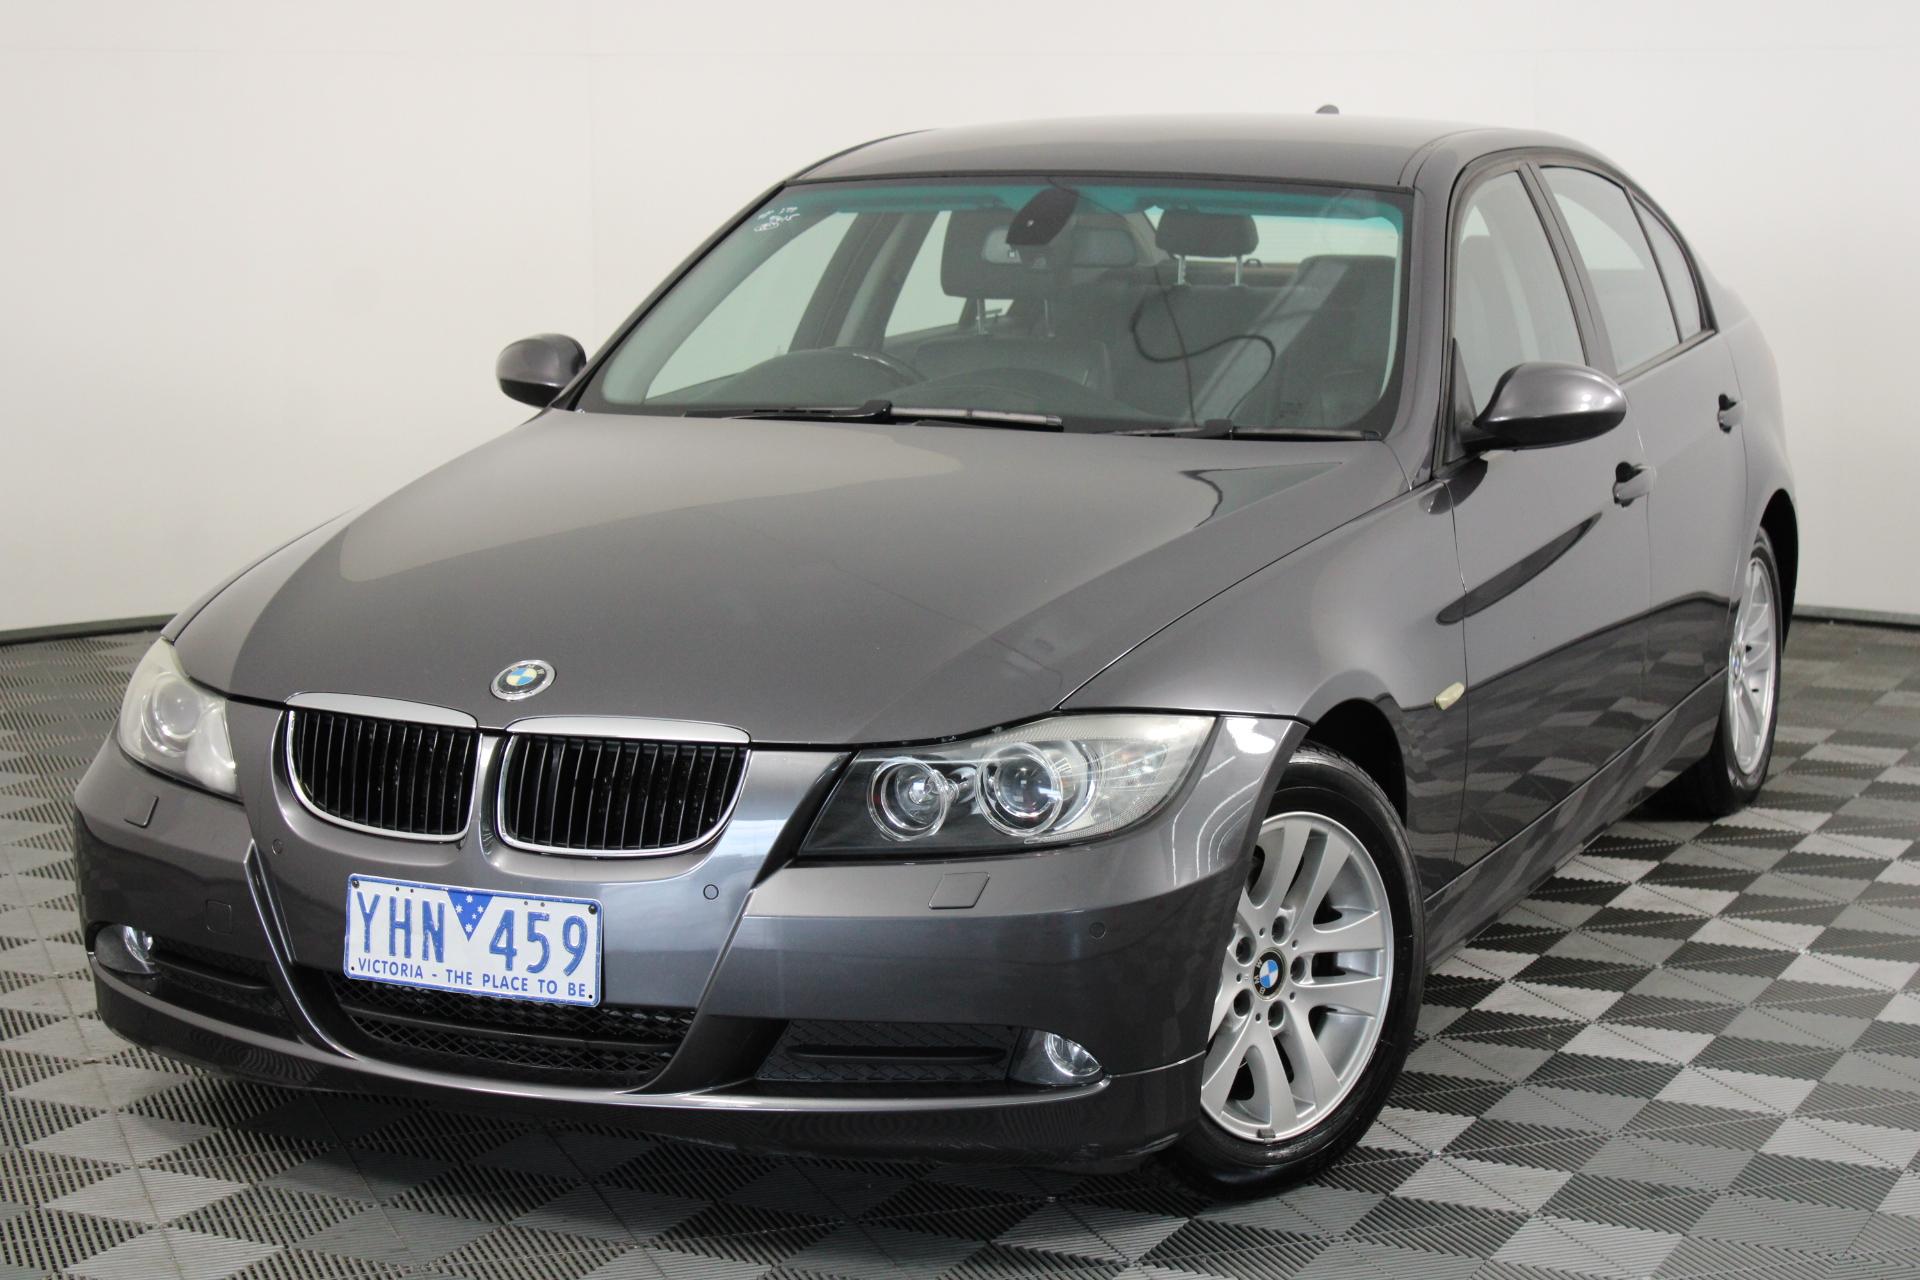 2008 BMW 3 20d E90 Turbo Diesel Automatic Sedan